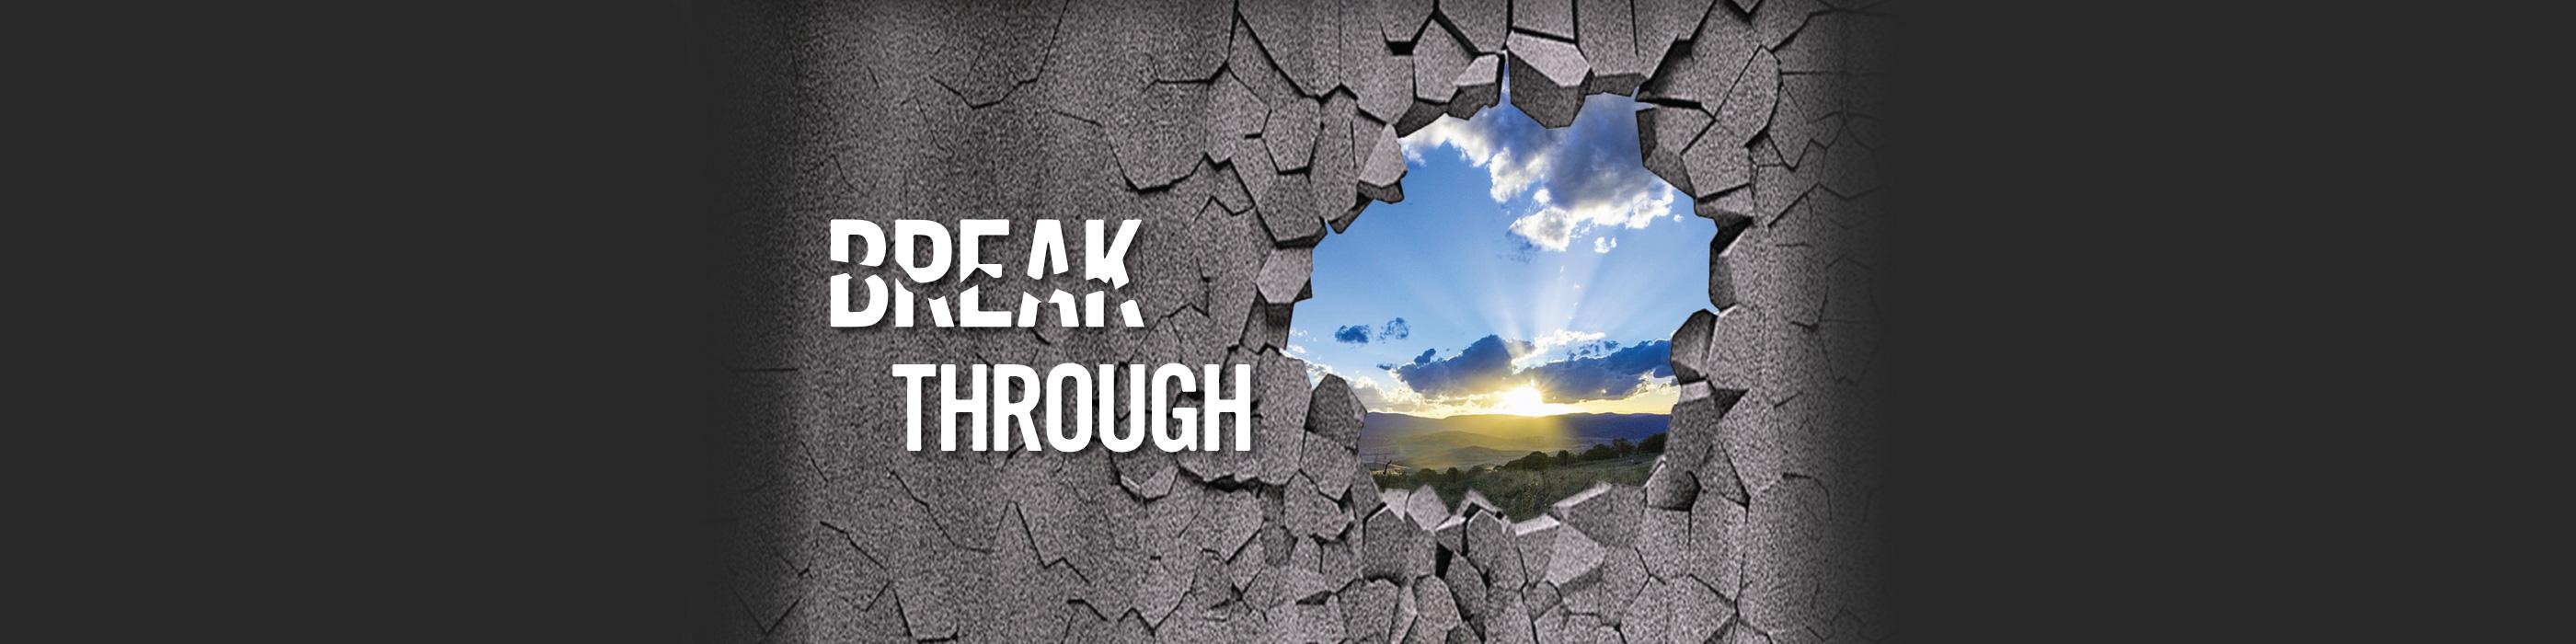 Summit-Church-Graphic-Breakthrough-WEB-2800x700